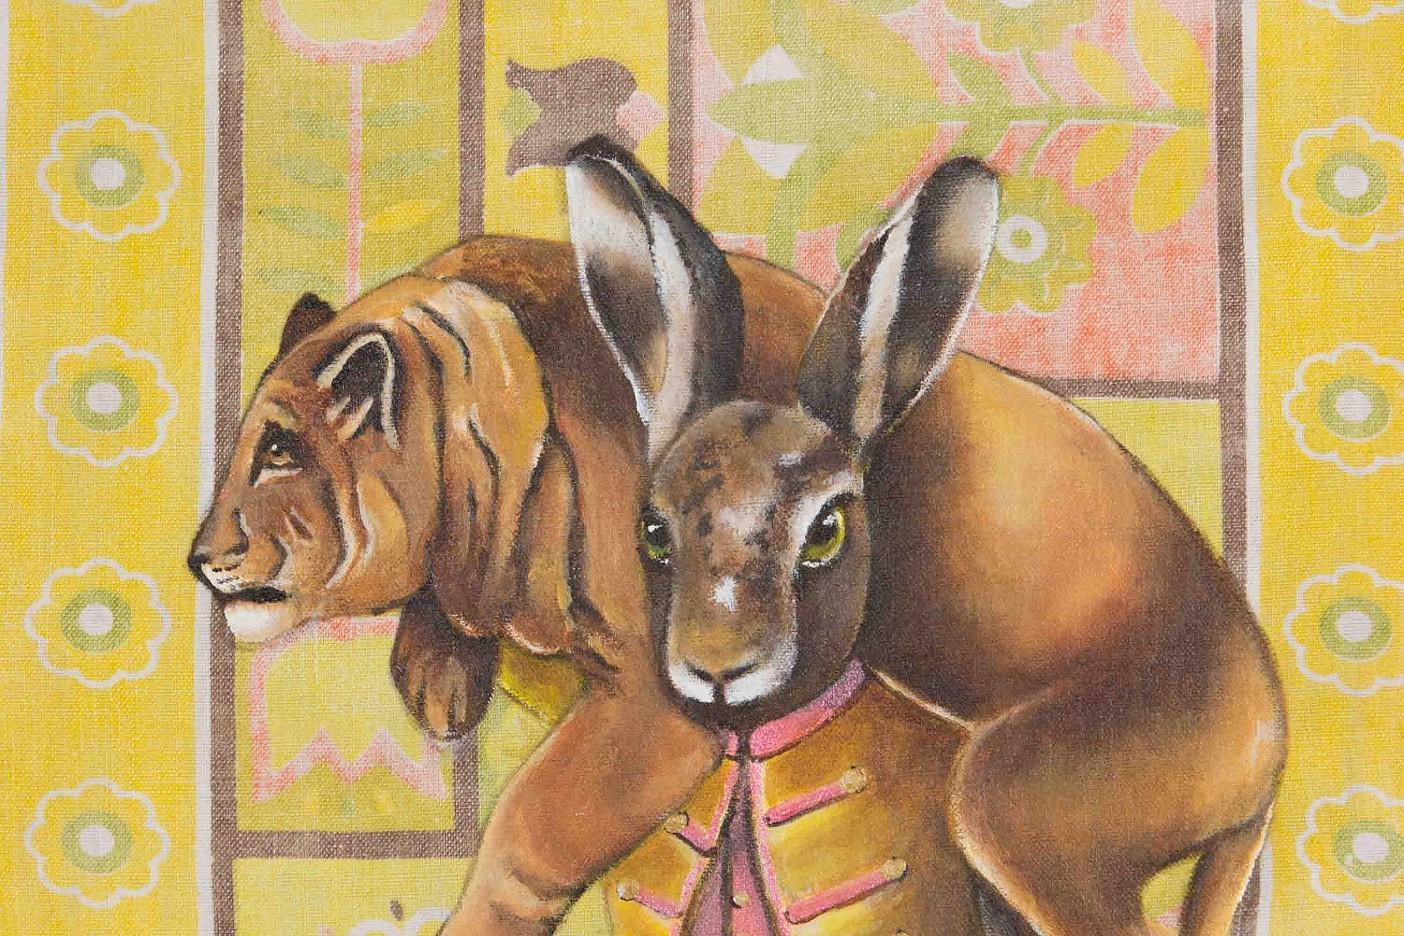 Giant Rabbit schafft alles was er will